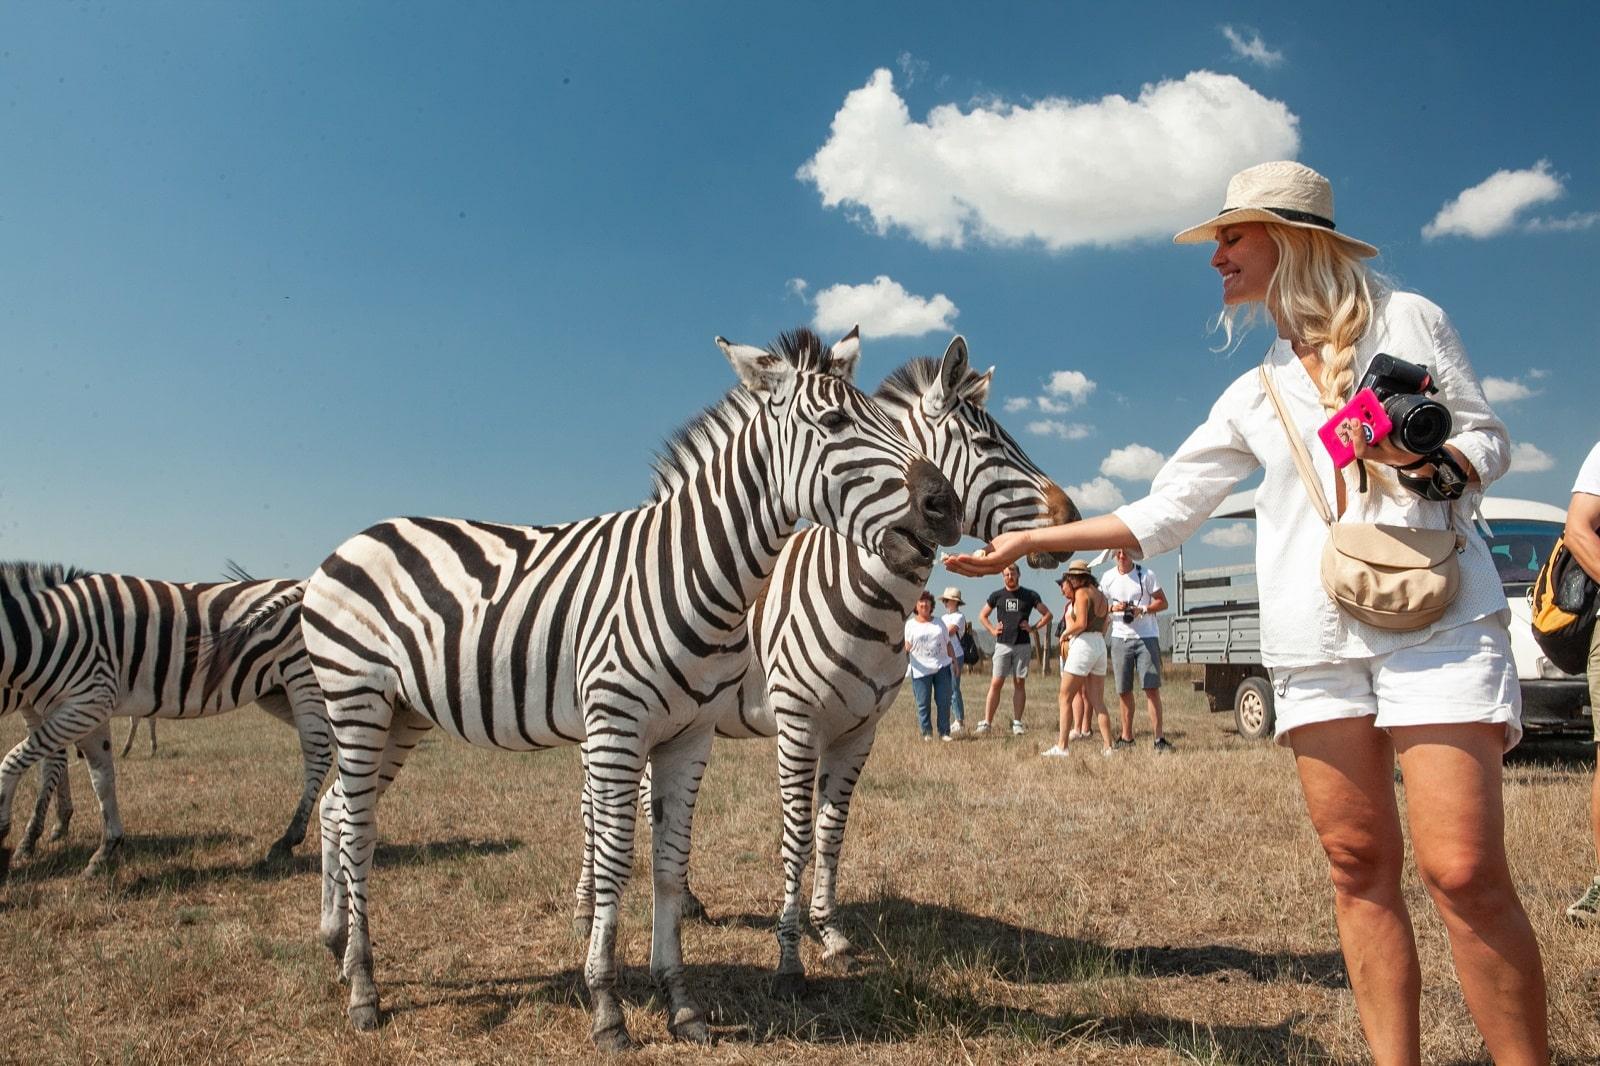 Зебры и туристка